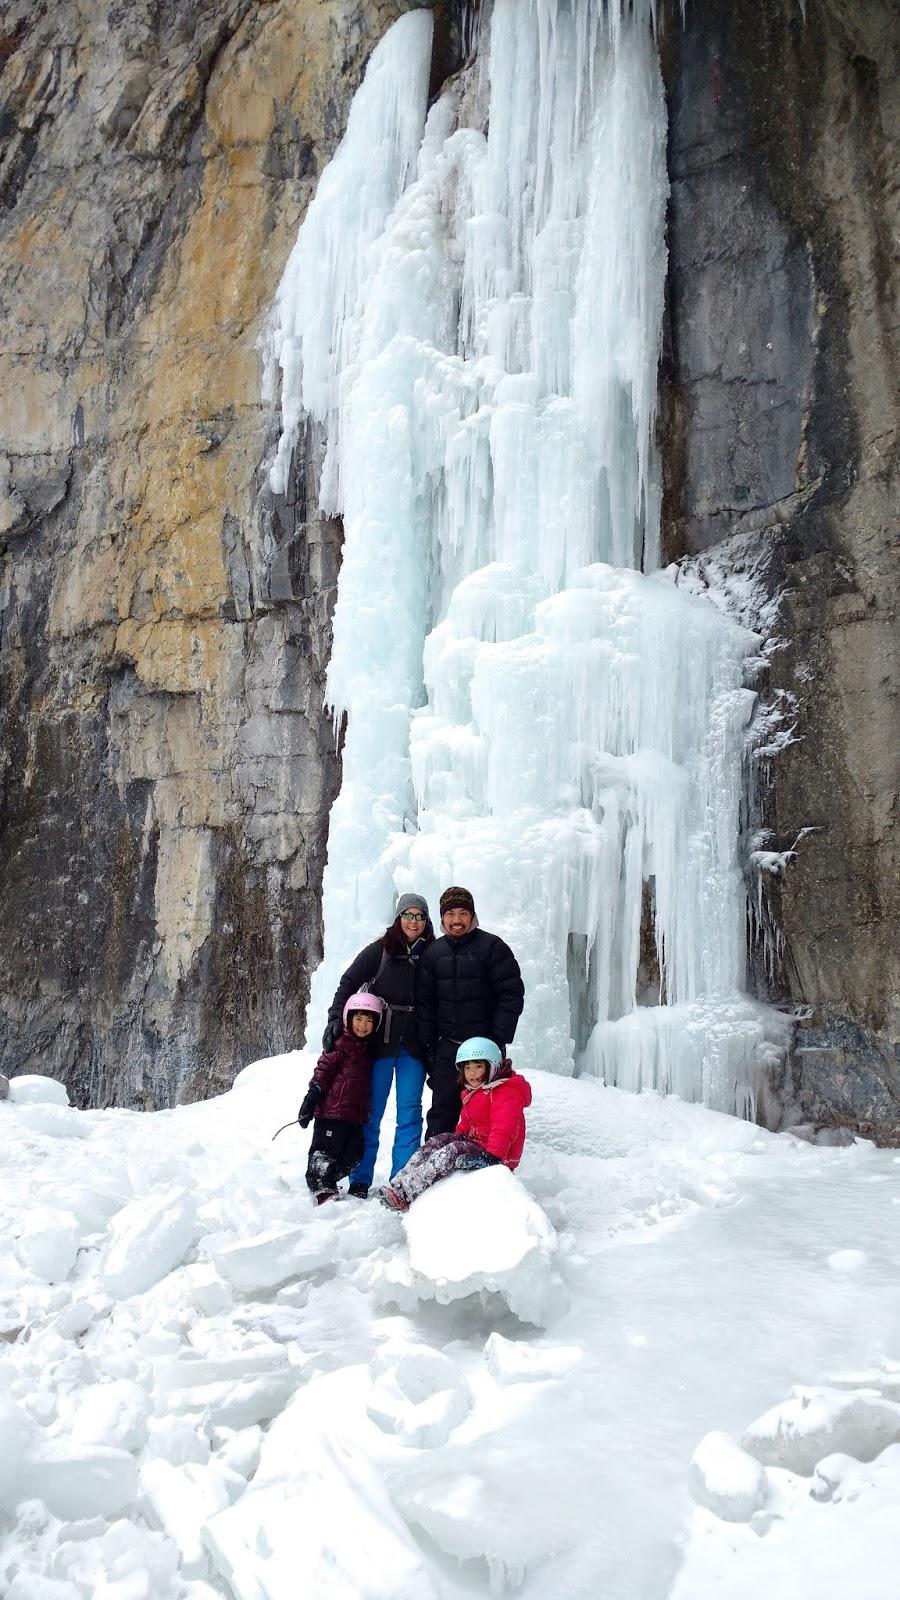 Grotto Canyon Ice Walk, Kananaskis